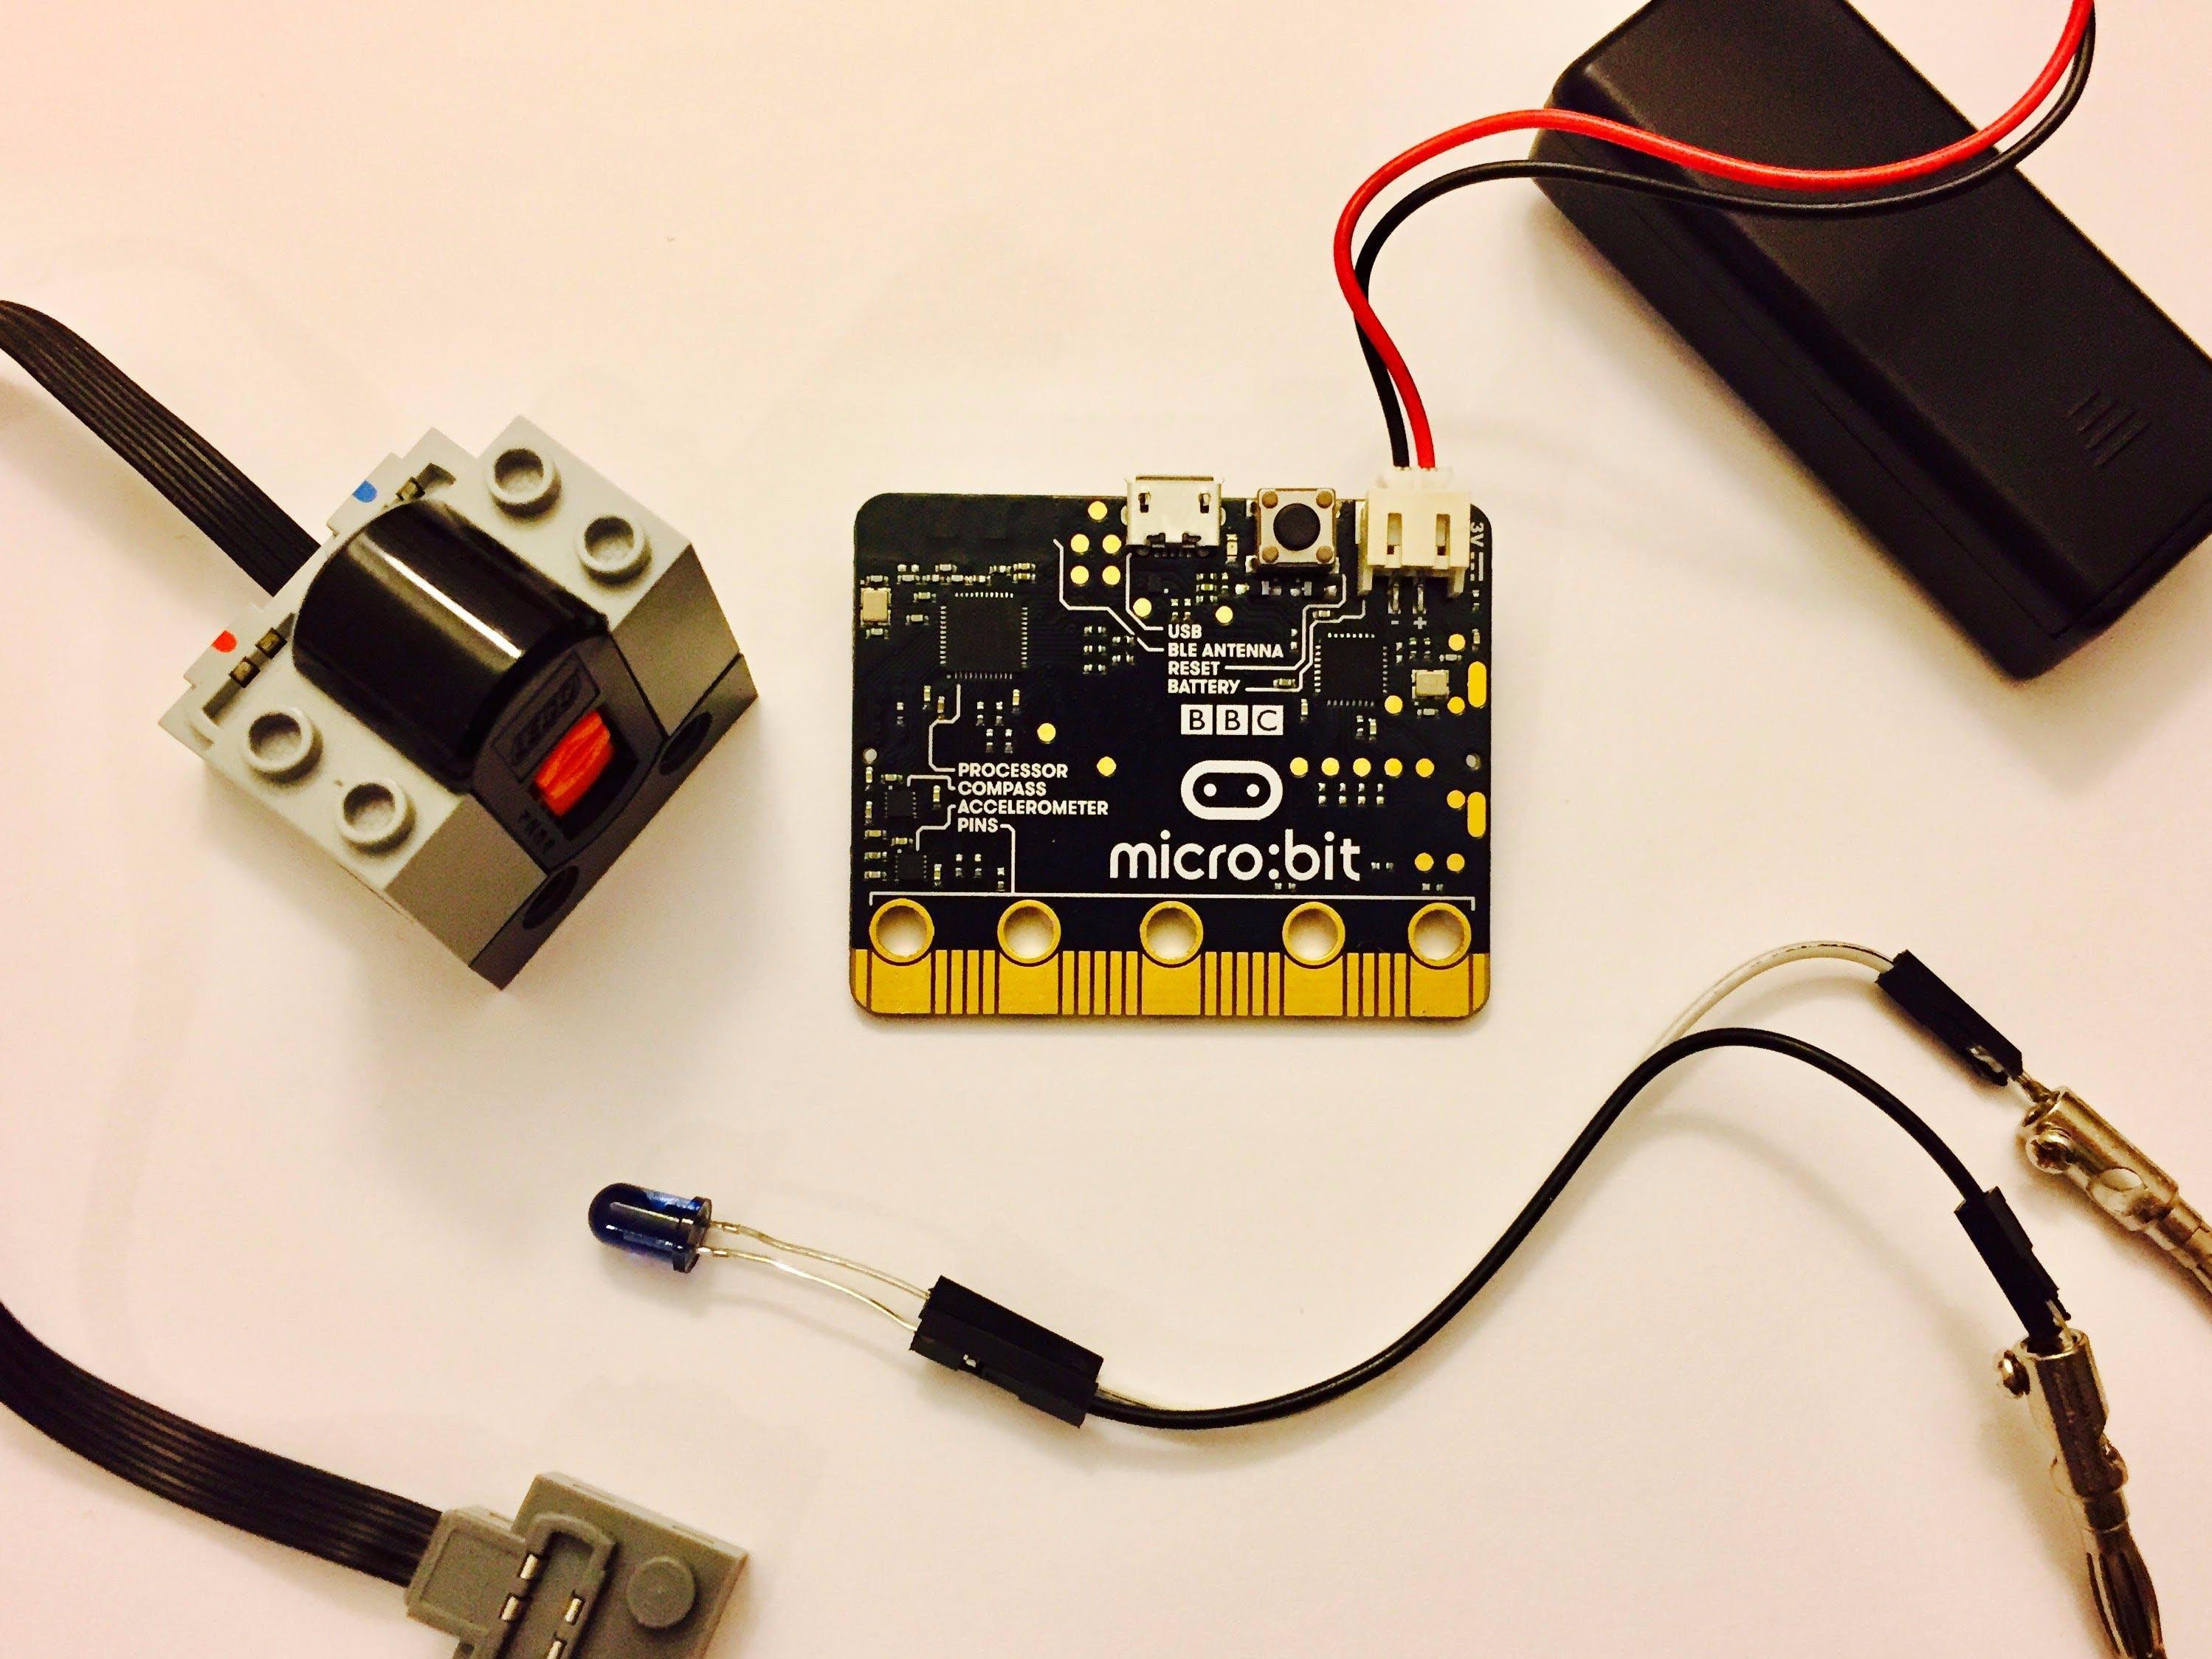 Lego® Power Functions IR Sender For Micro:bit